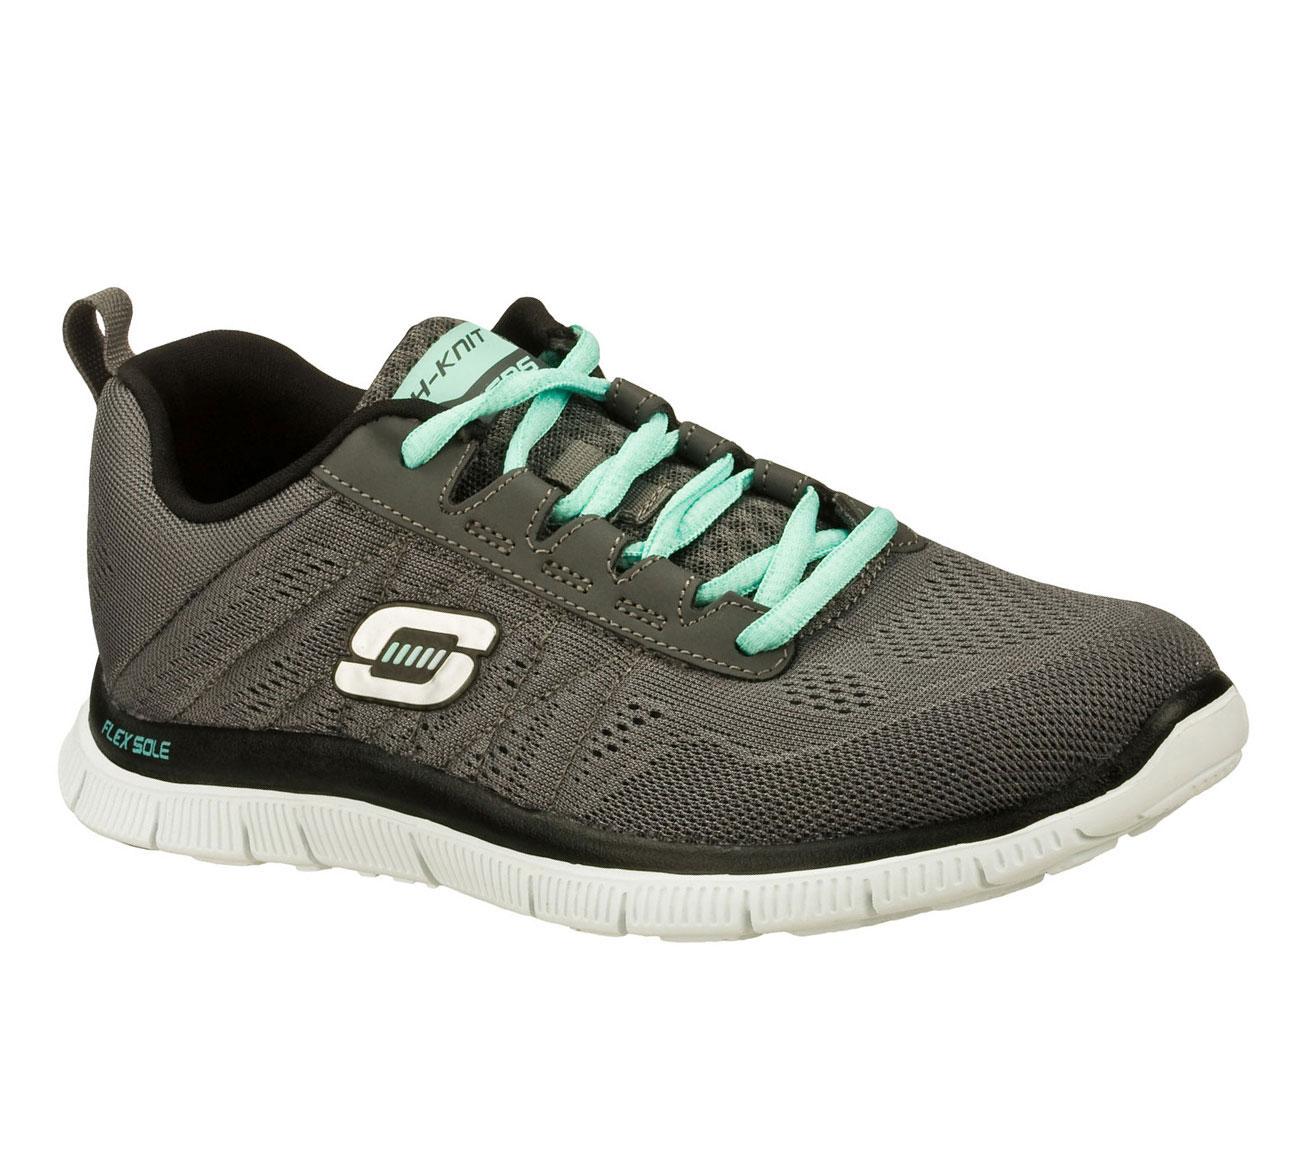 buy skechers flex appeal sweet spotwalking shoes shoes. Black Bedroom Furniture Sets. Home Design Ideas